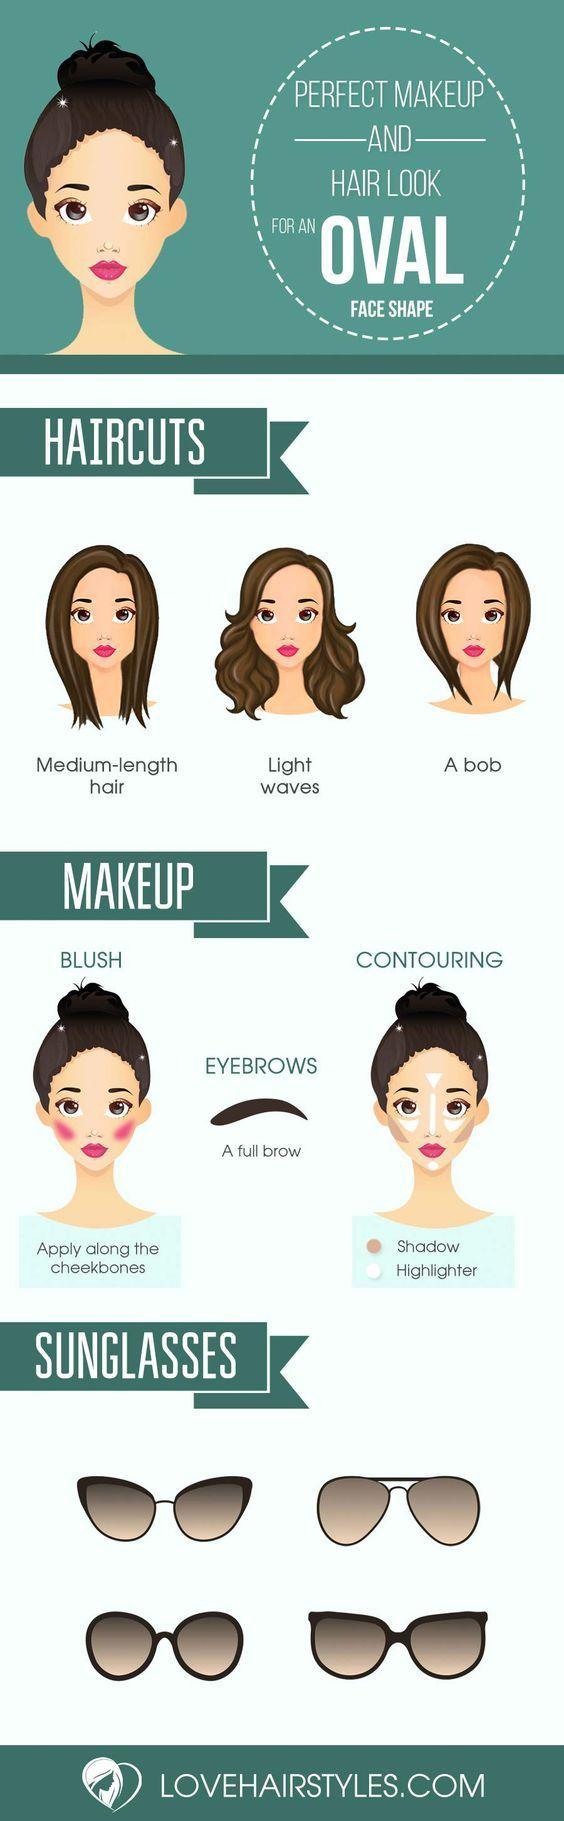 Hair and makeup for oval face beauty makeup pinterest makeup